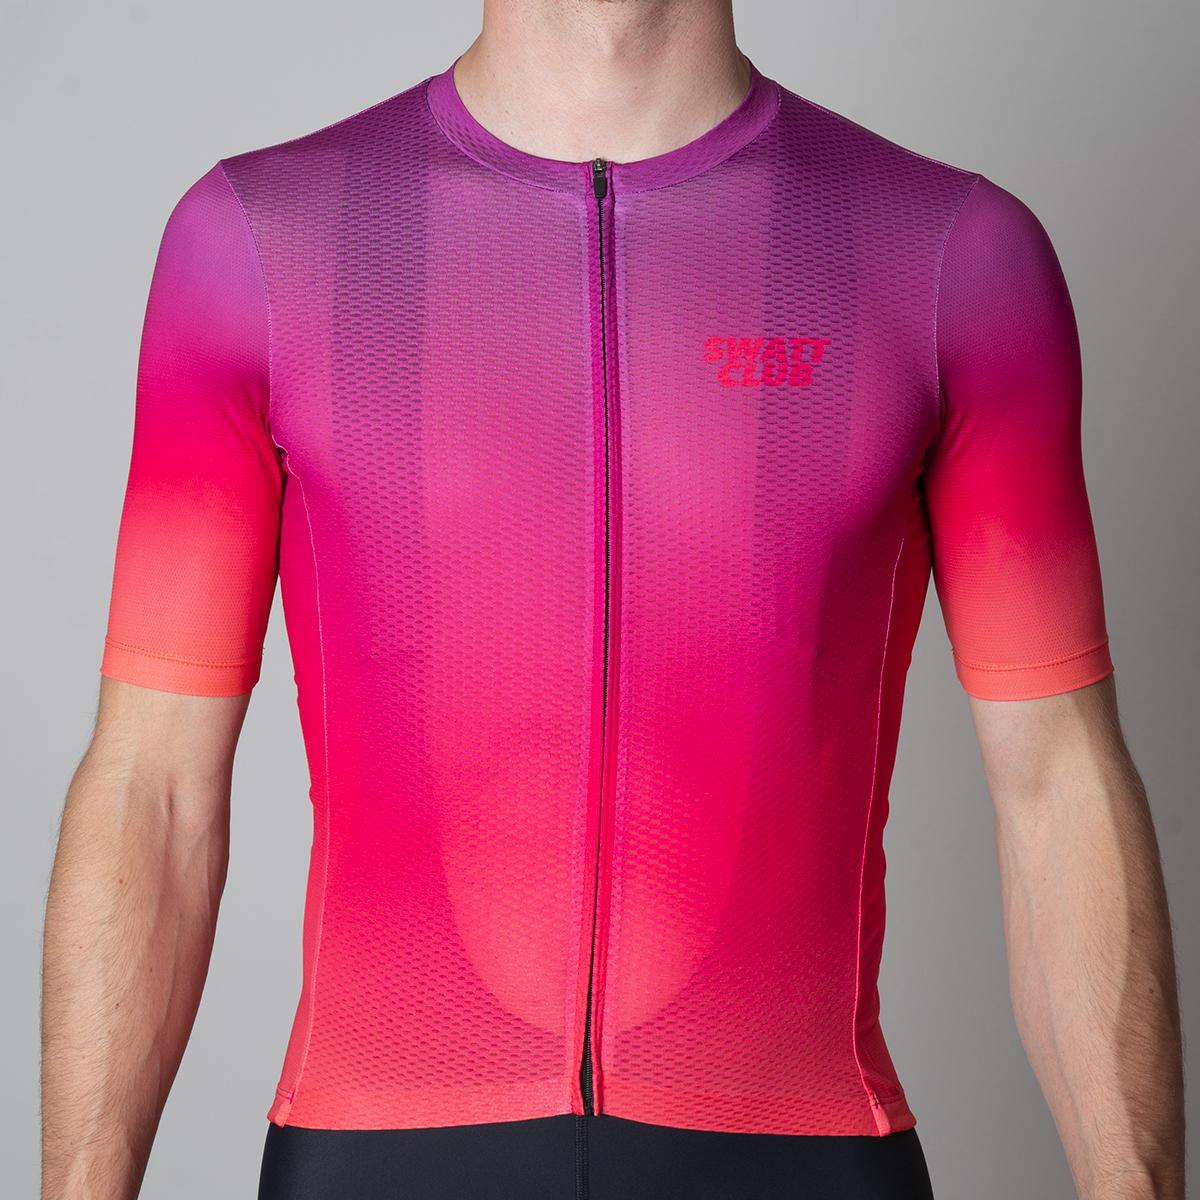 Ciliegia cycling jersey swatt club